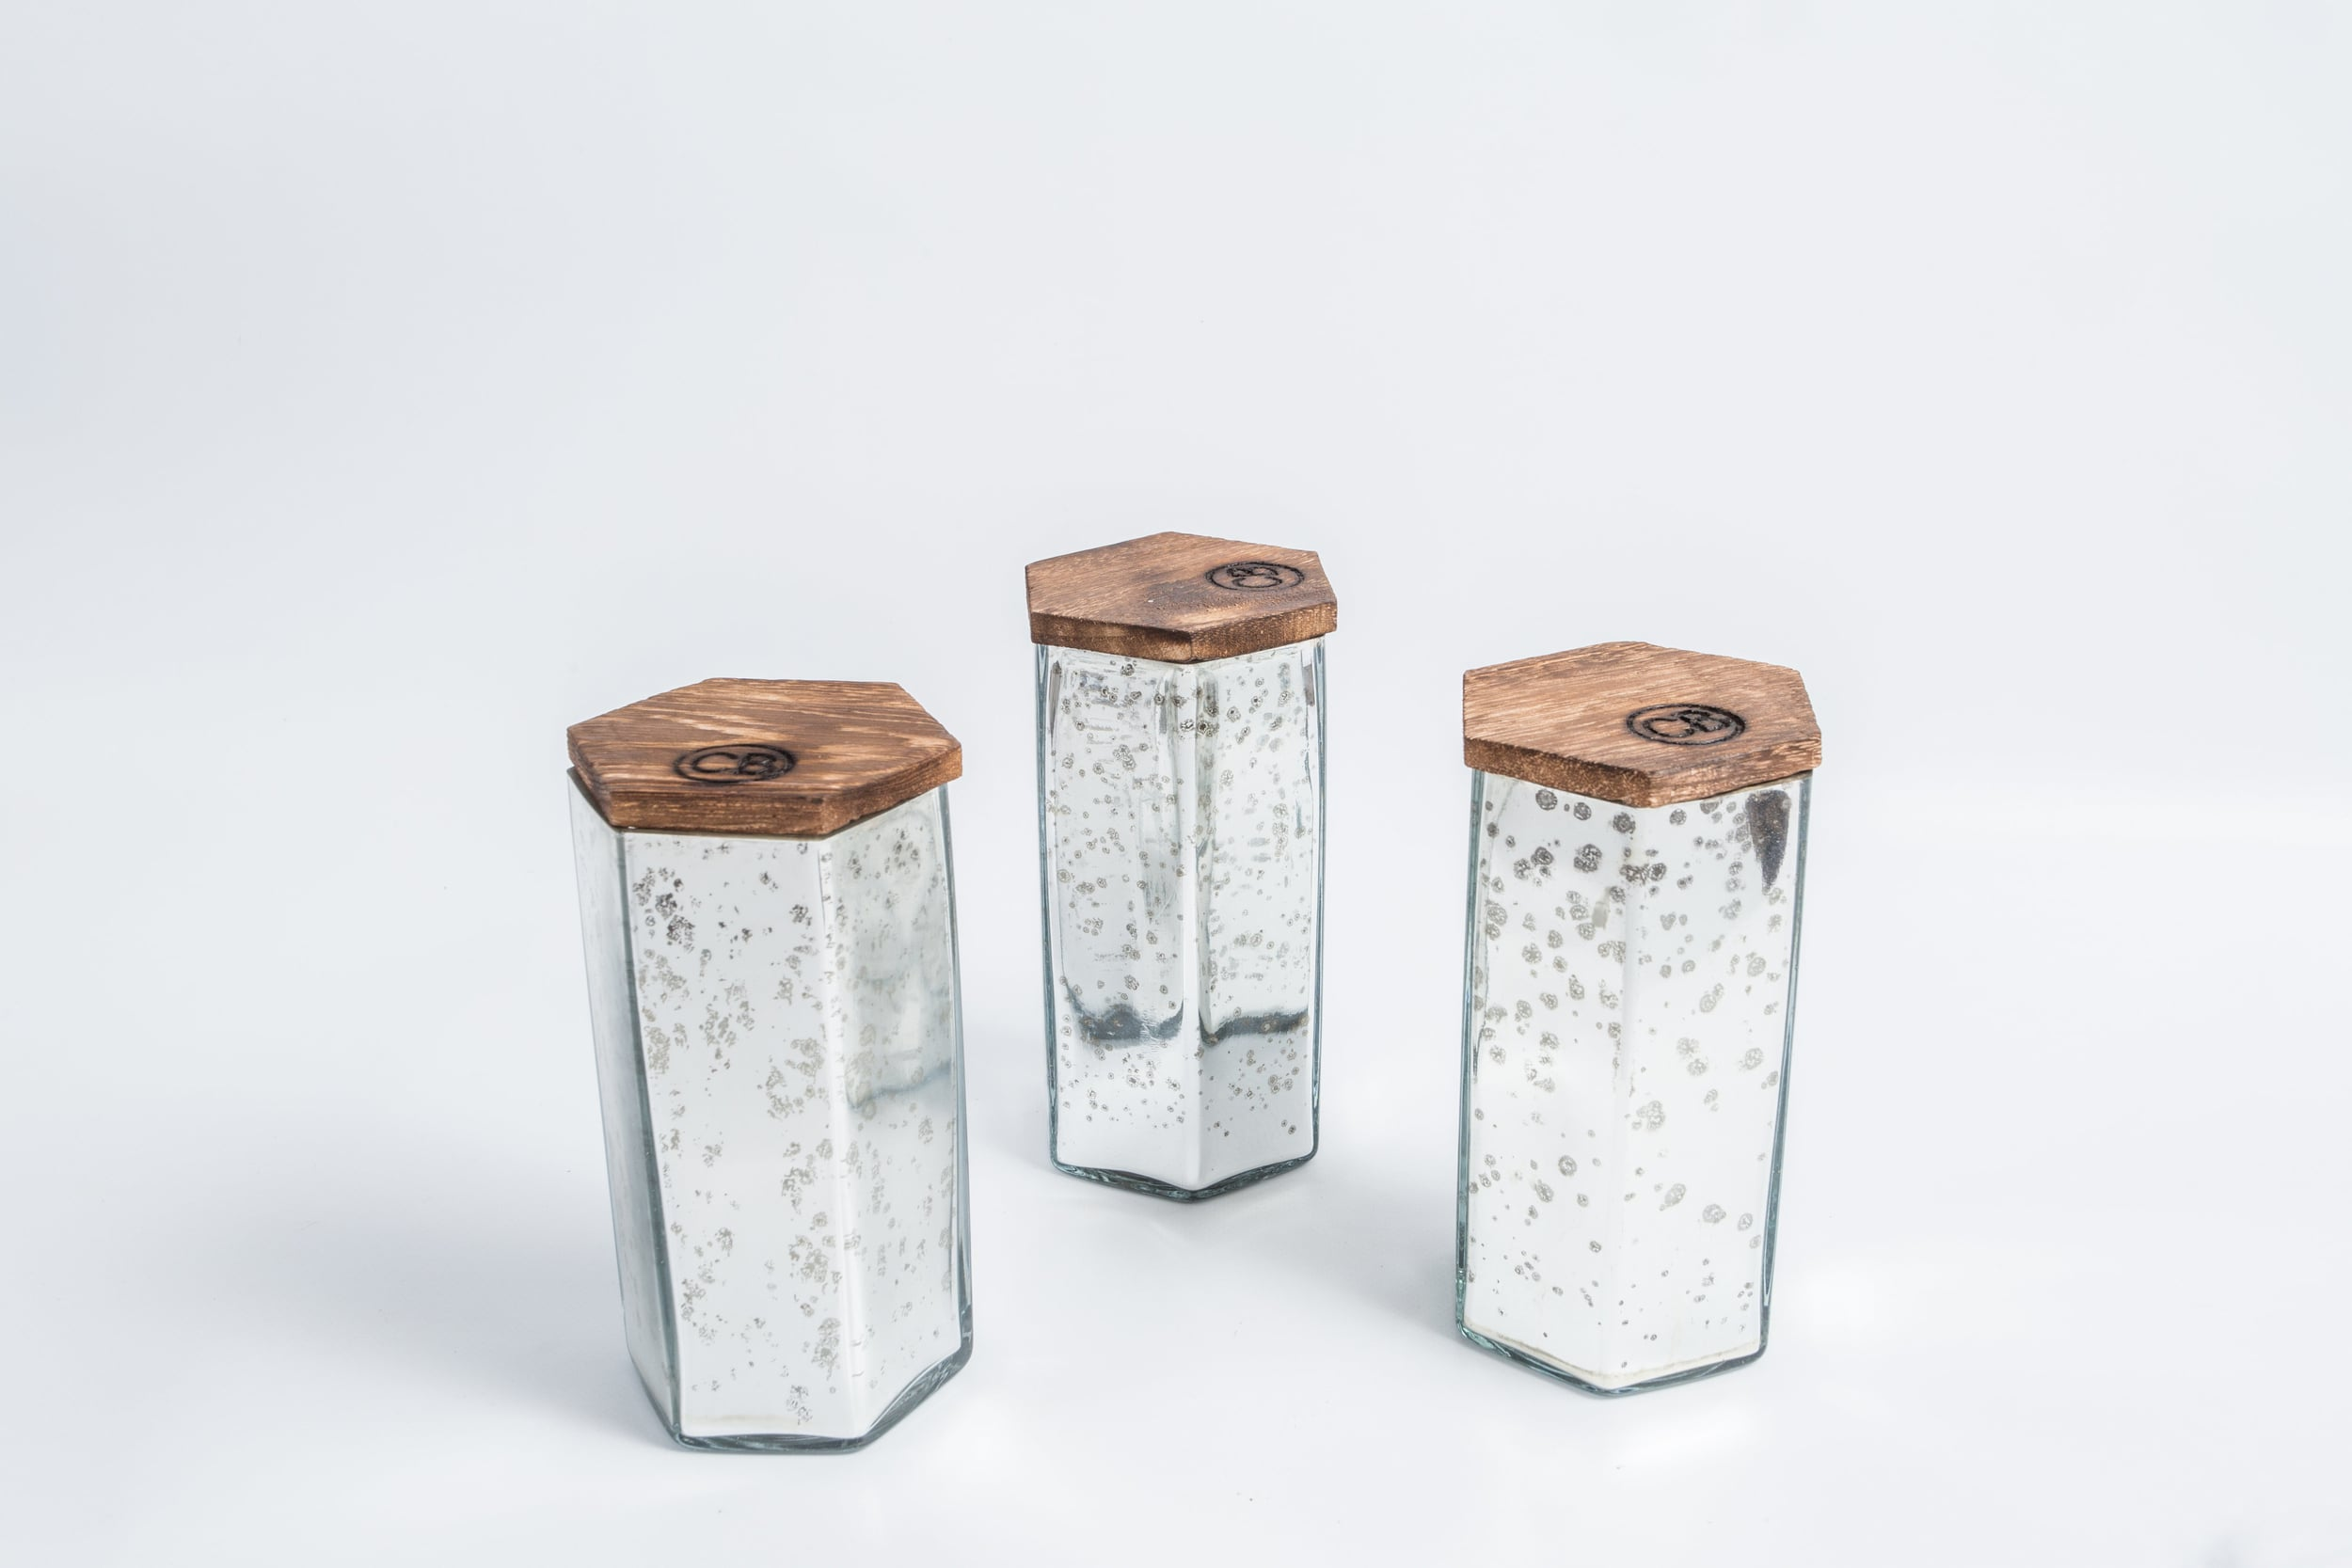 17 oz.MERCURY GLASS CANDLE